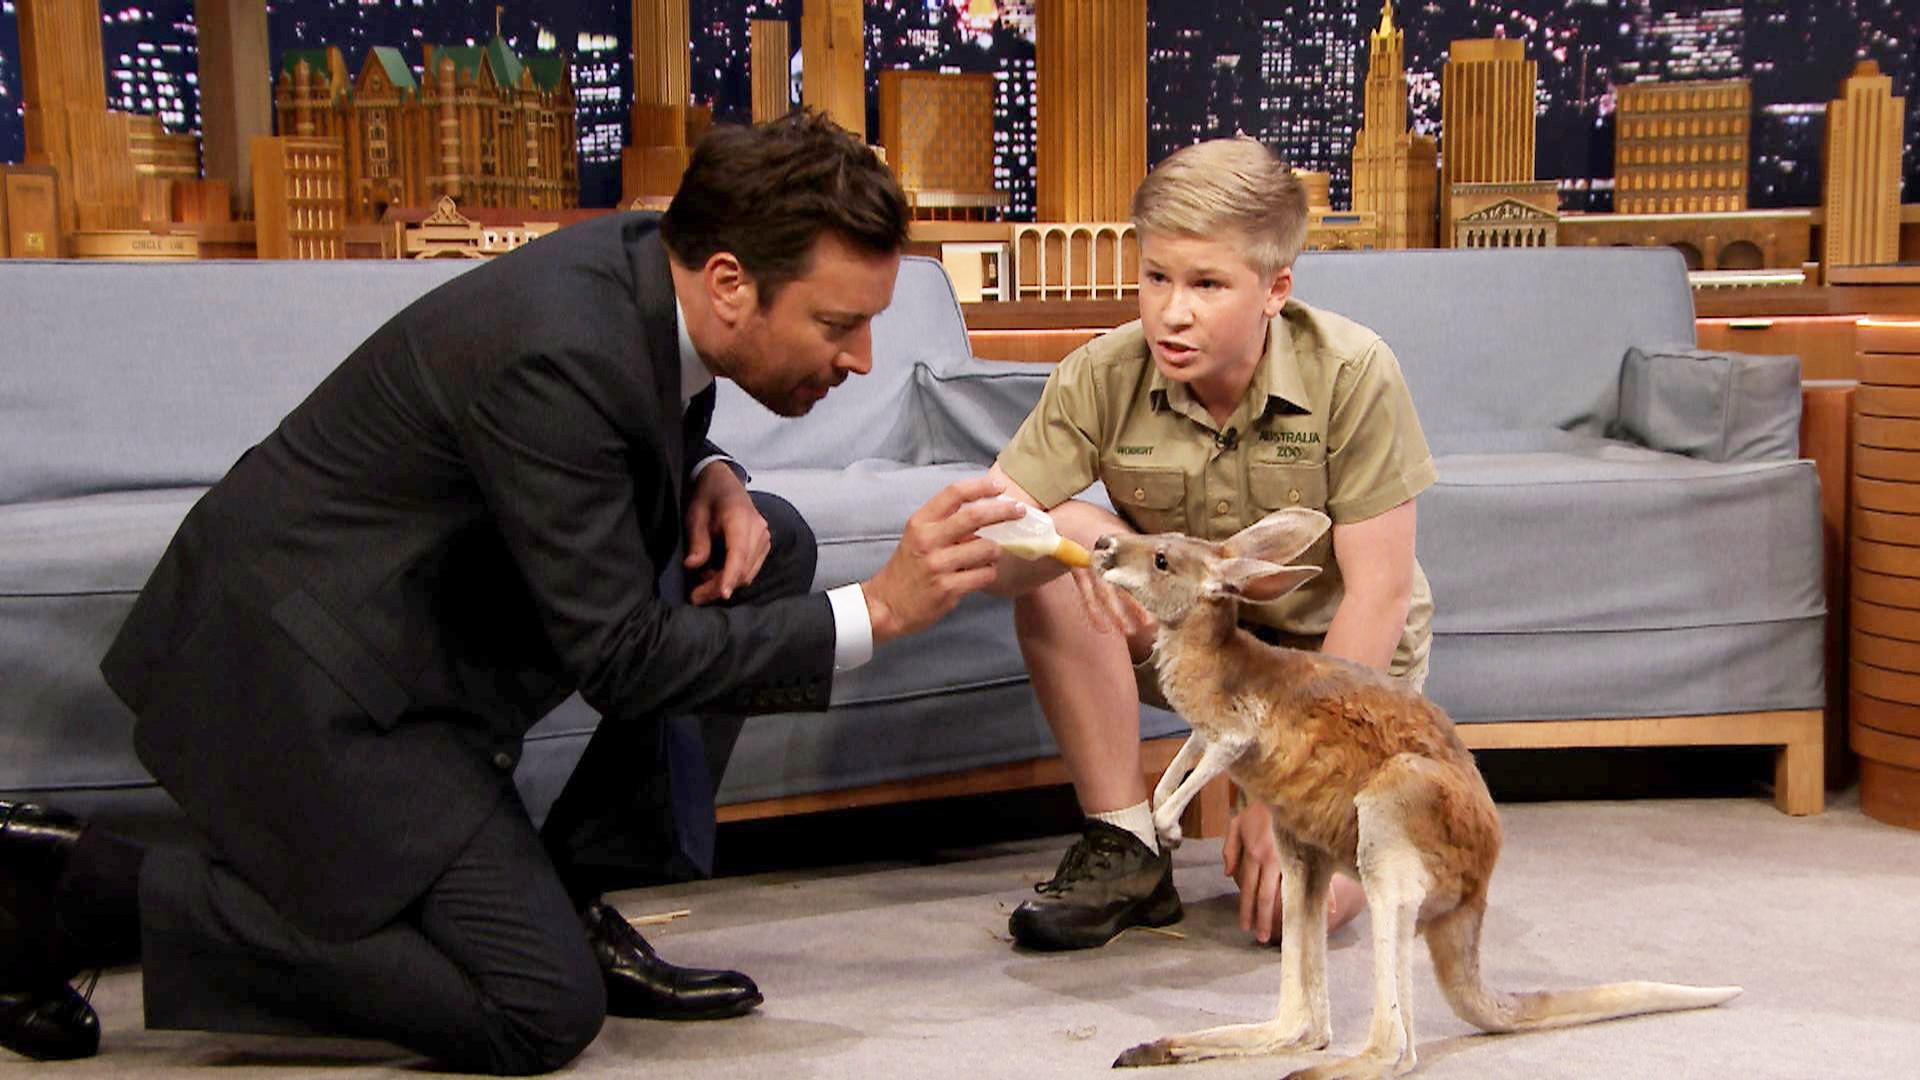 Robert Irwin and Jimmy Feed a Baby Kangaroo